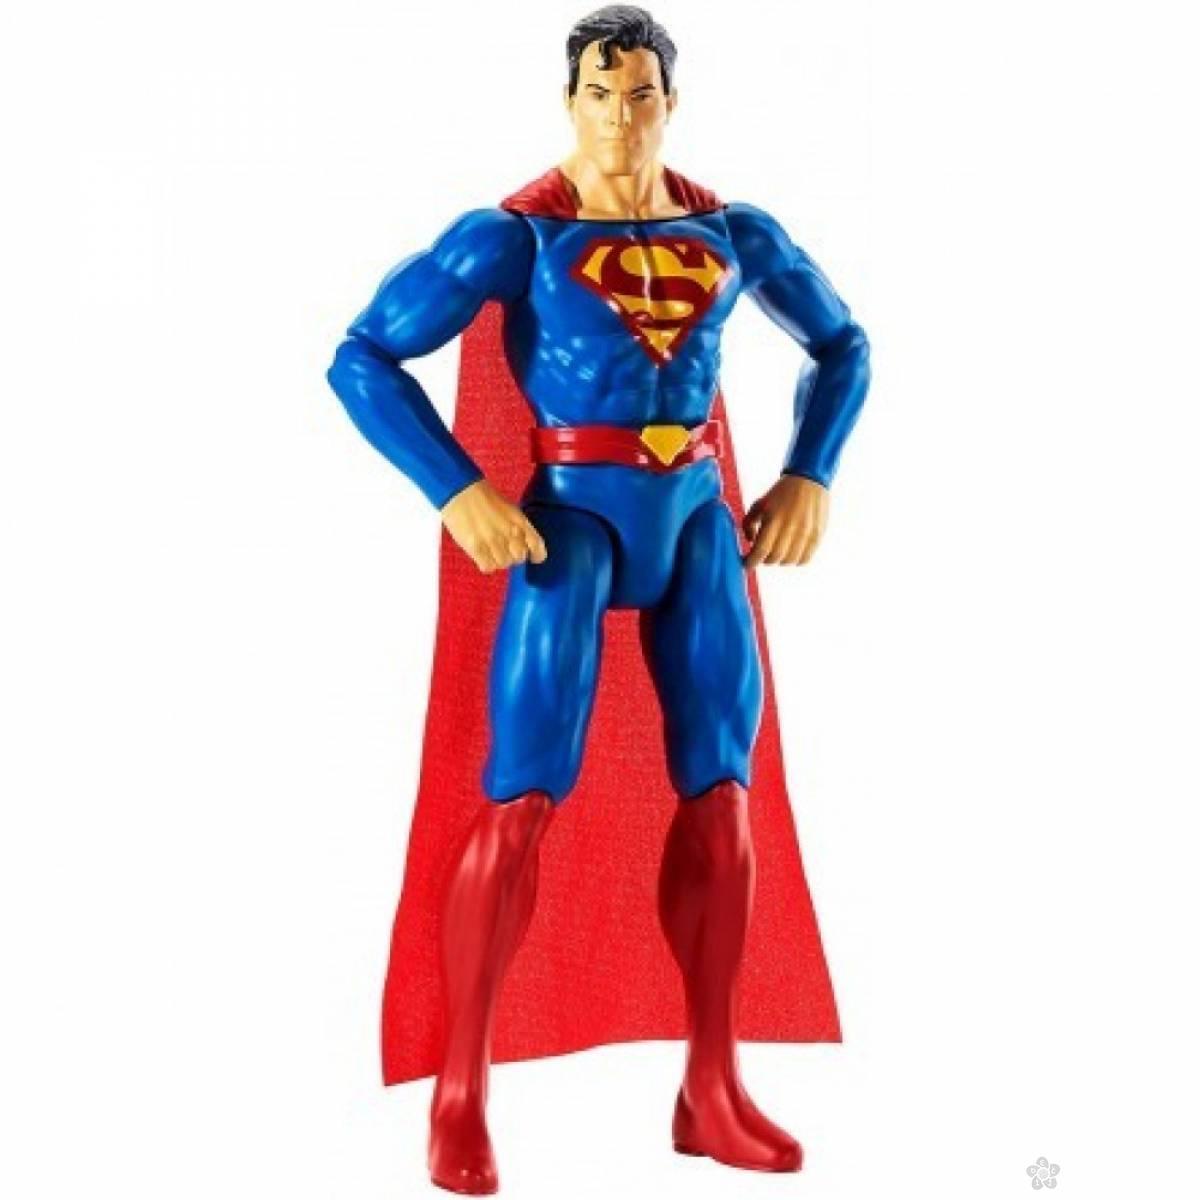 Akcijska figura osnovni model Superman MAGDT50